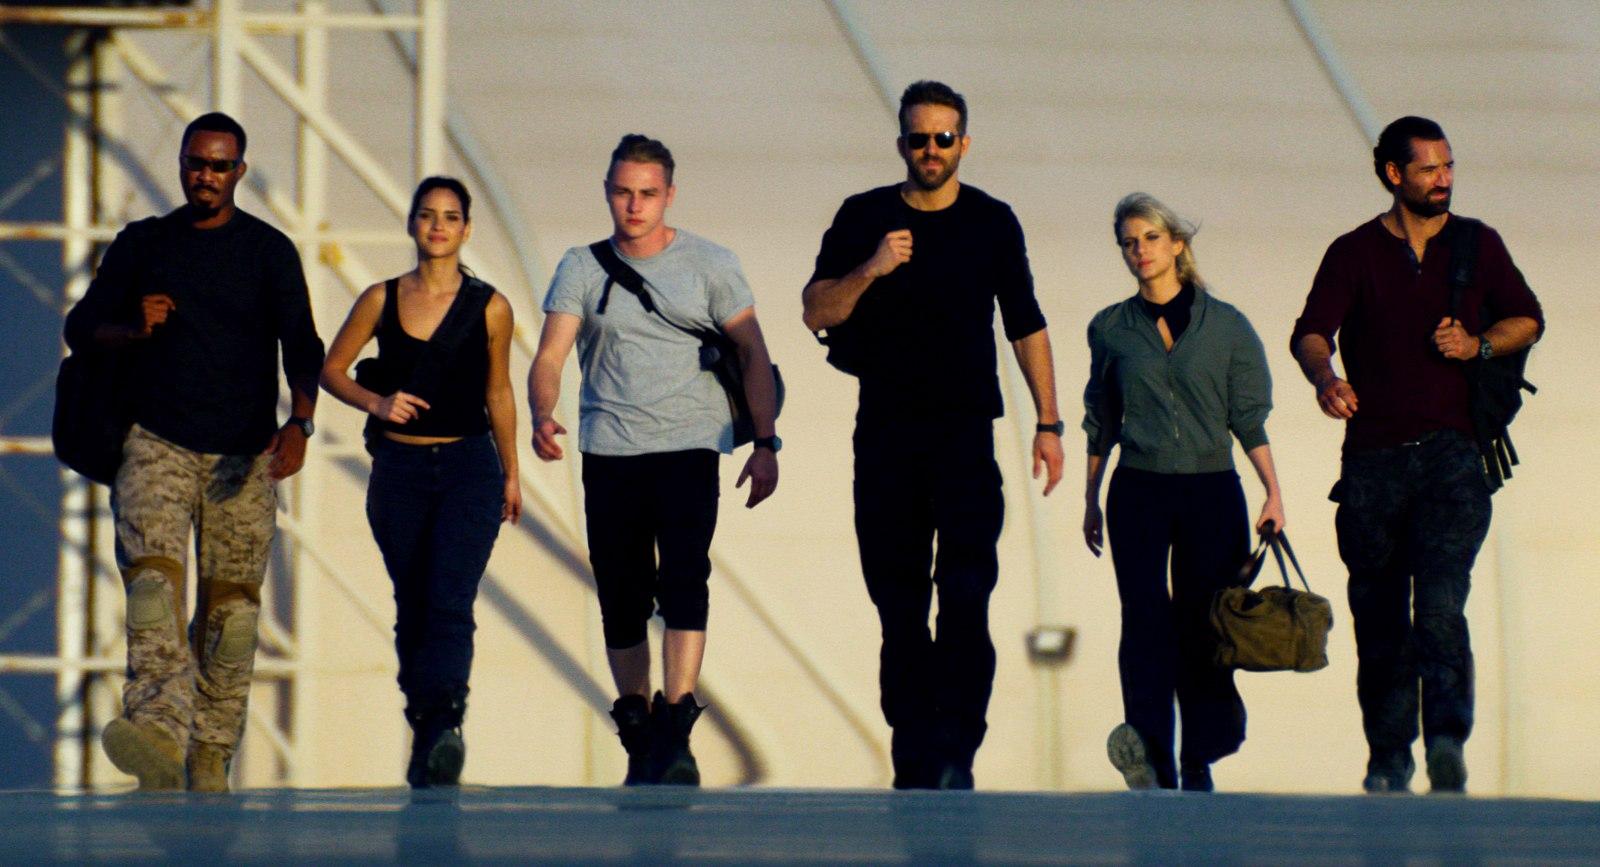 """6 UNDERGROUND"" (2019) - Pictured: Corey Hawkins, Adria Arjona, Ben Hardy, Ryan Reynolds, Mélanie Laurent, Manuel Garcia-RulfoPhoto Courtesy of Netflix"